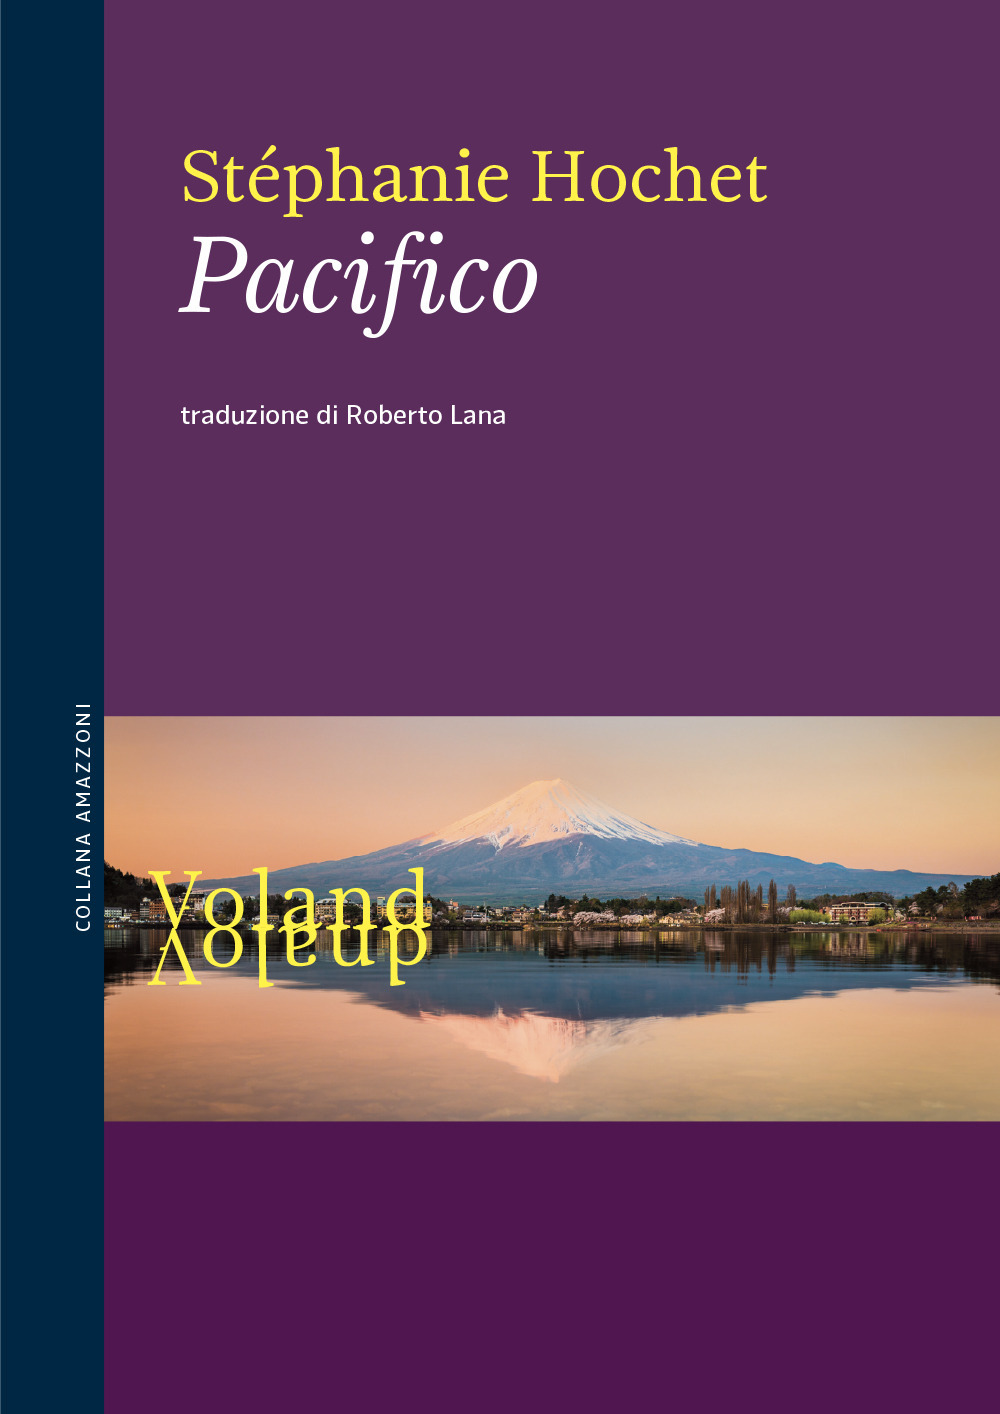 PACIFICO - Hochet Stéphanie - 9788862434218